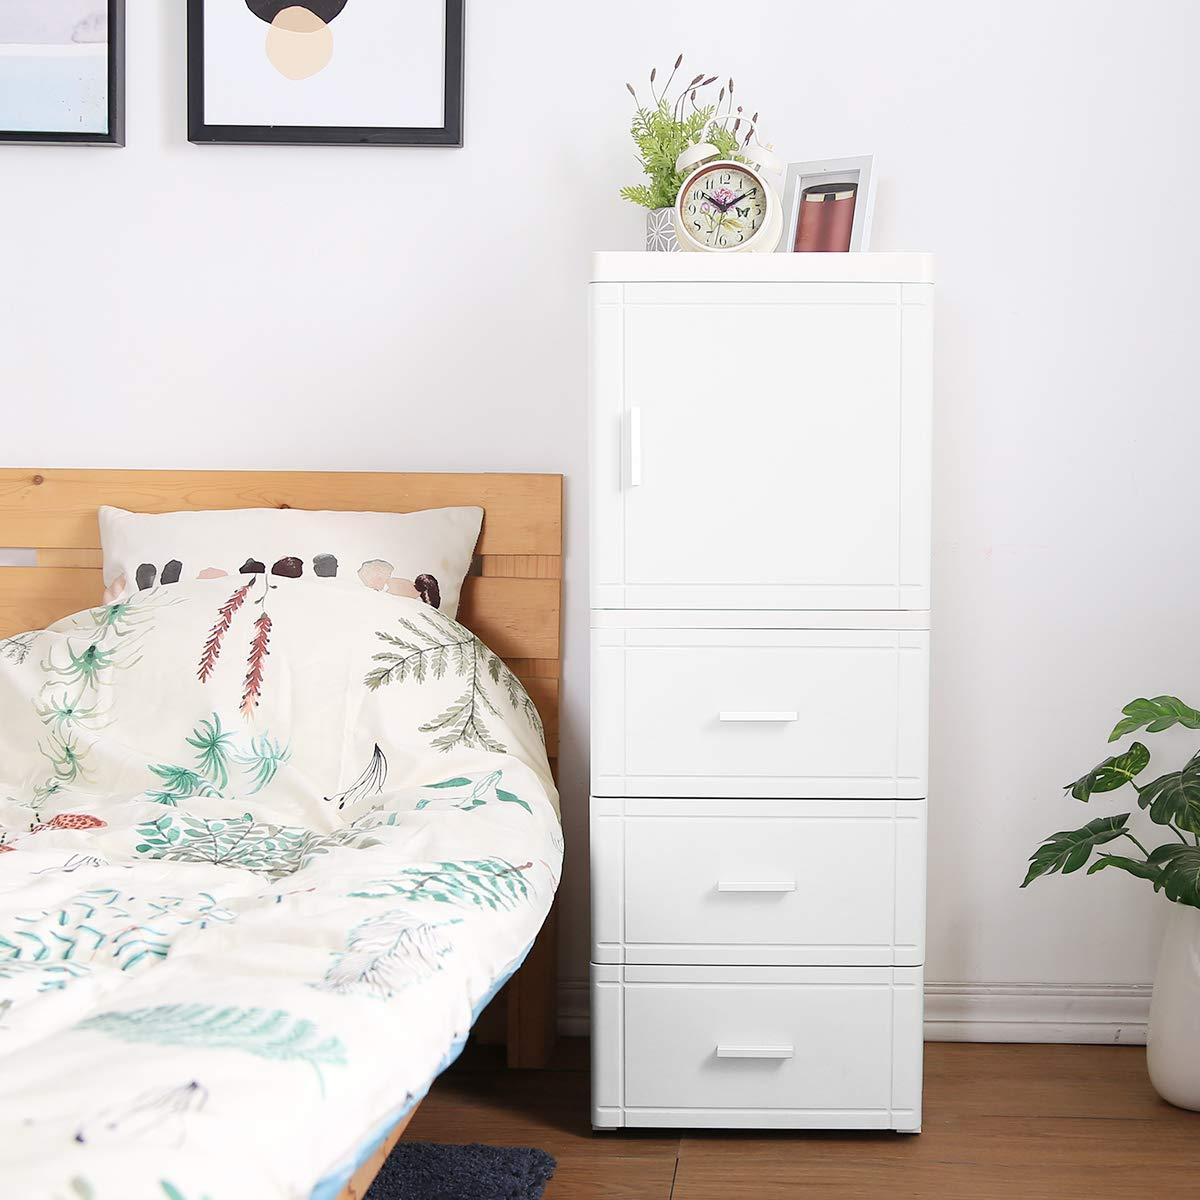 Nafenai 4 Drawer White Chest Dresser, 1-Door Storage Cabinet on Wheels for Bedroom, Kitchen, Bathroom, Hallway and More